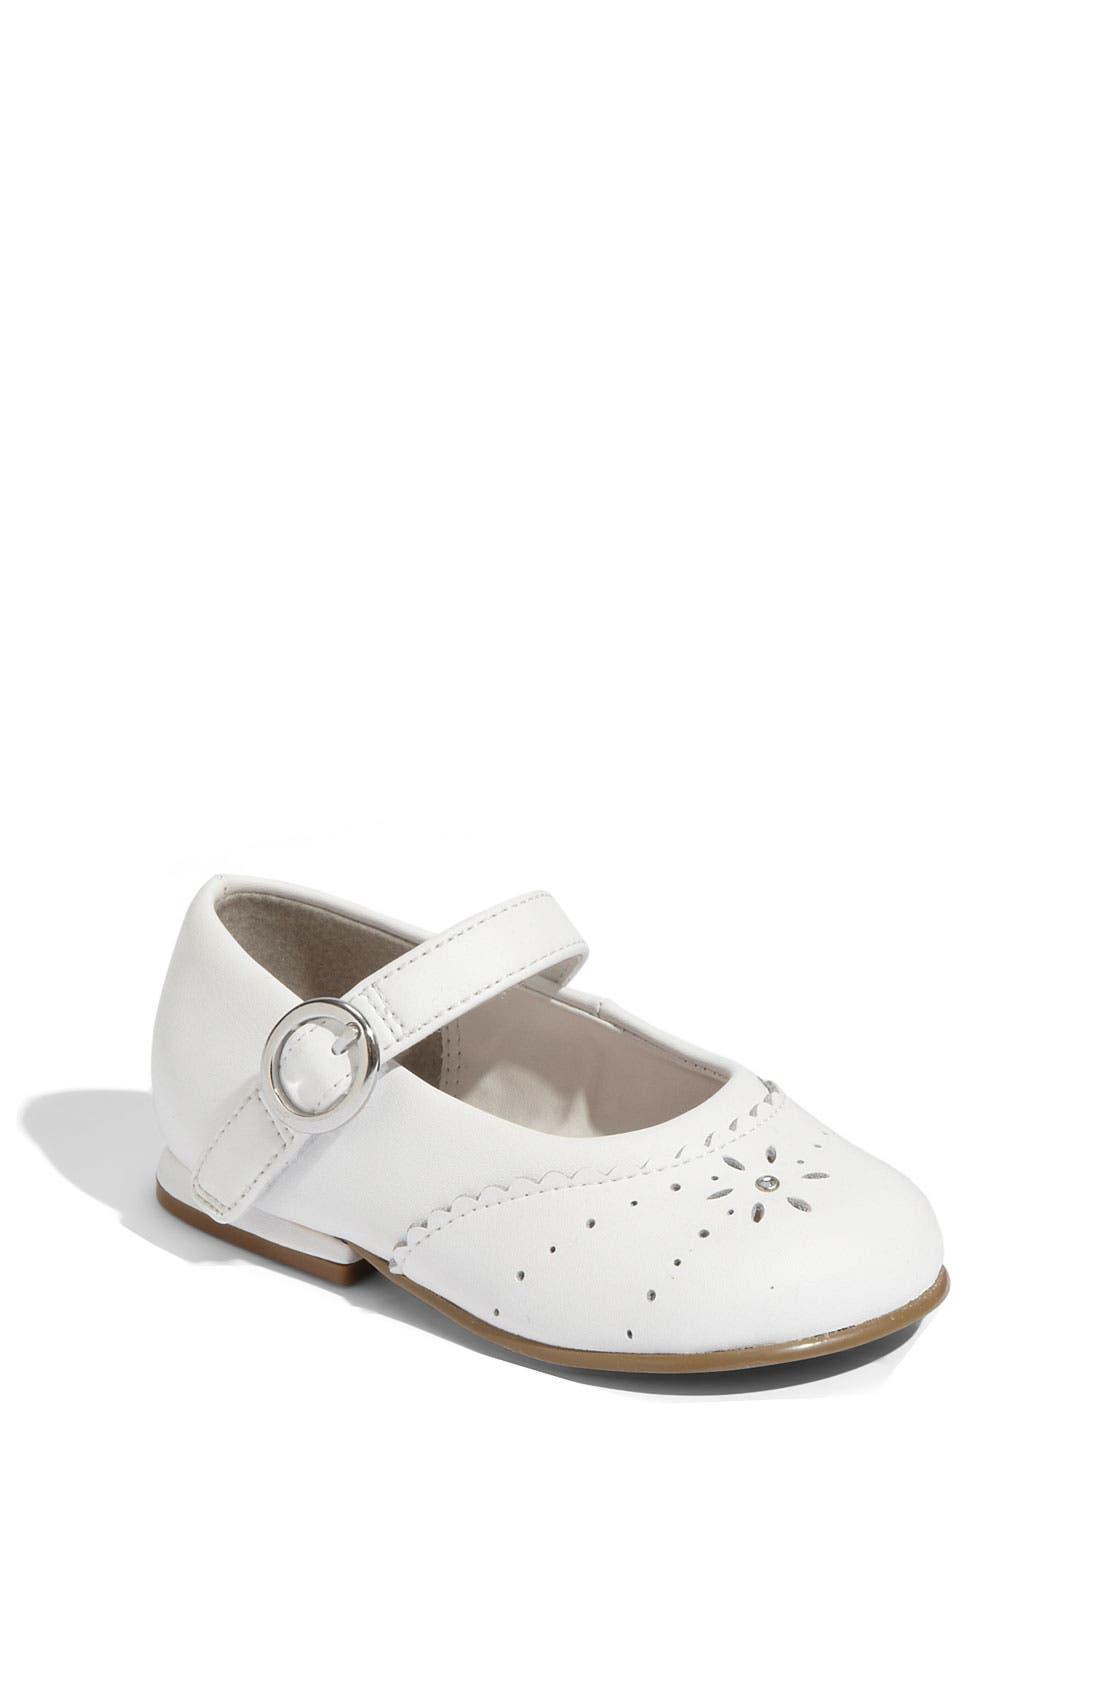 STRIDE RITE 'Camila' Mary Jane, Main, color, White Leather